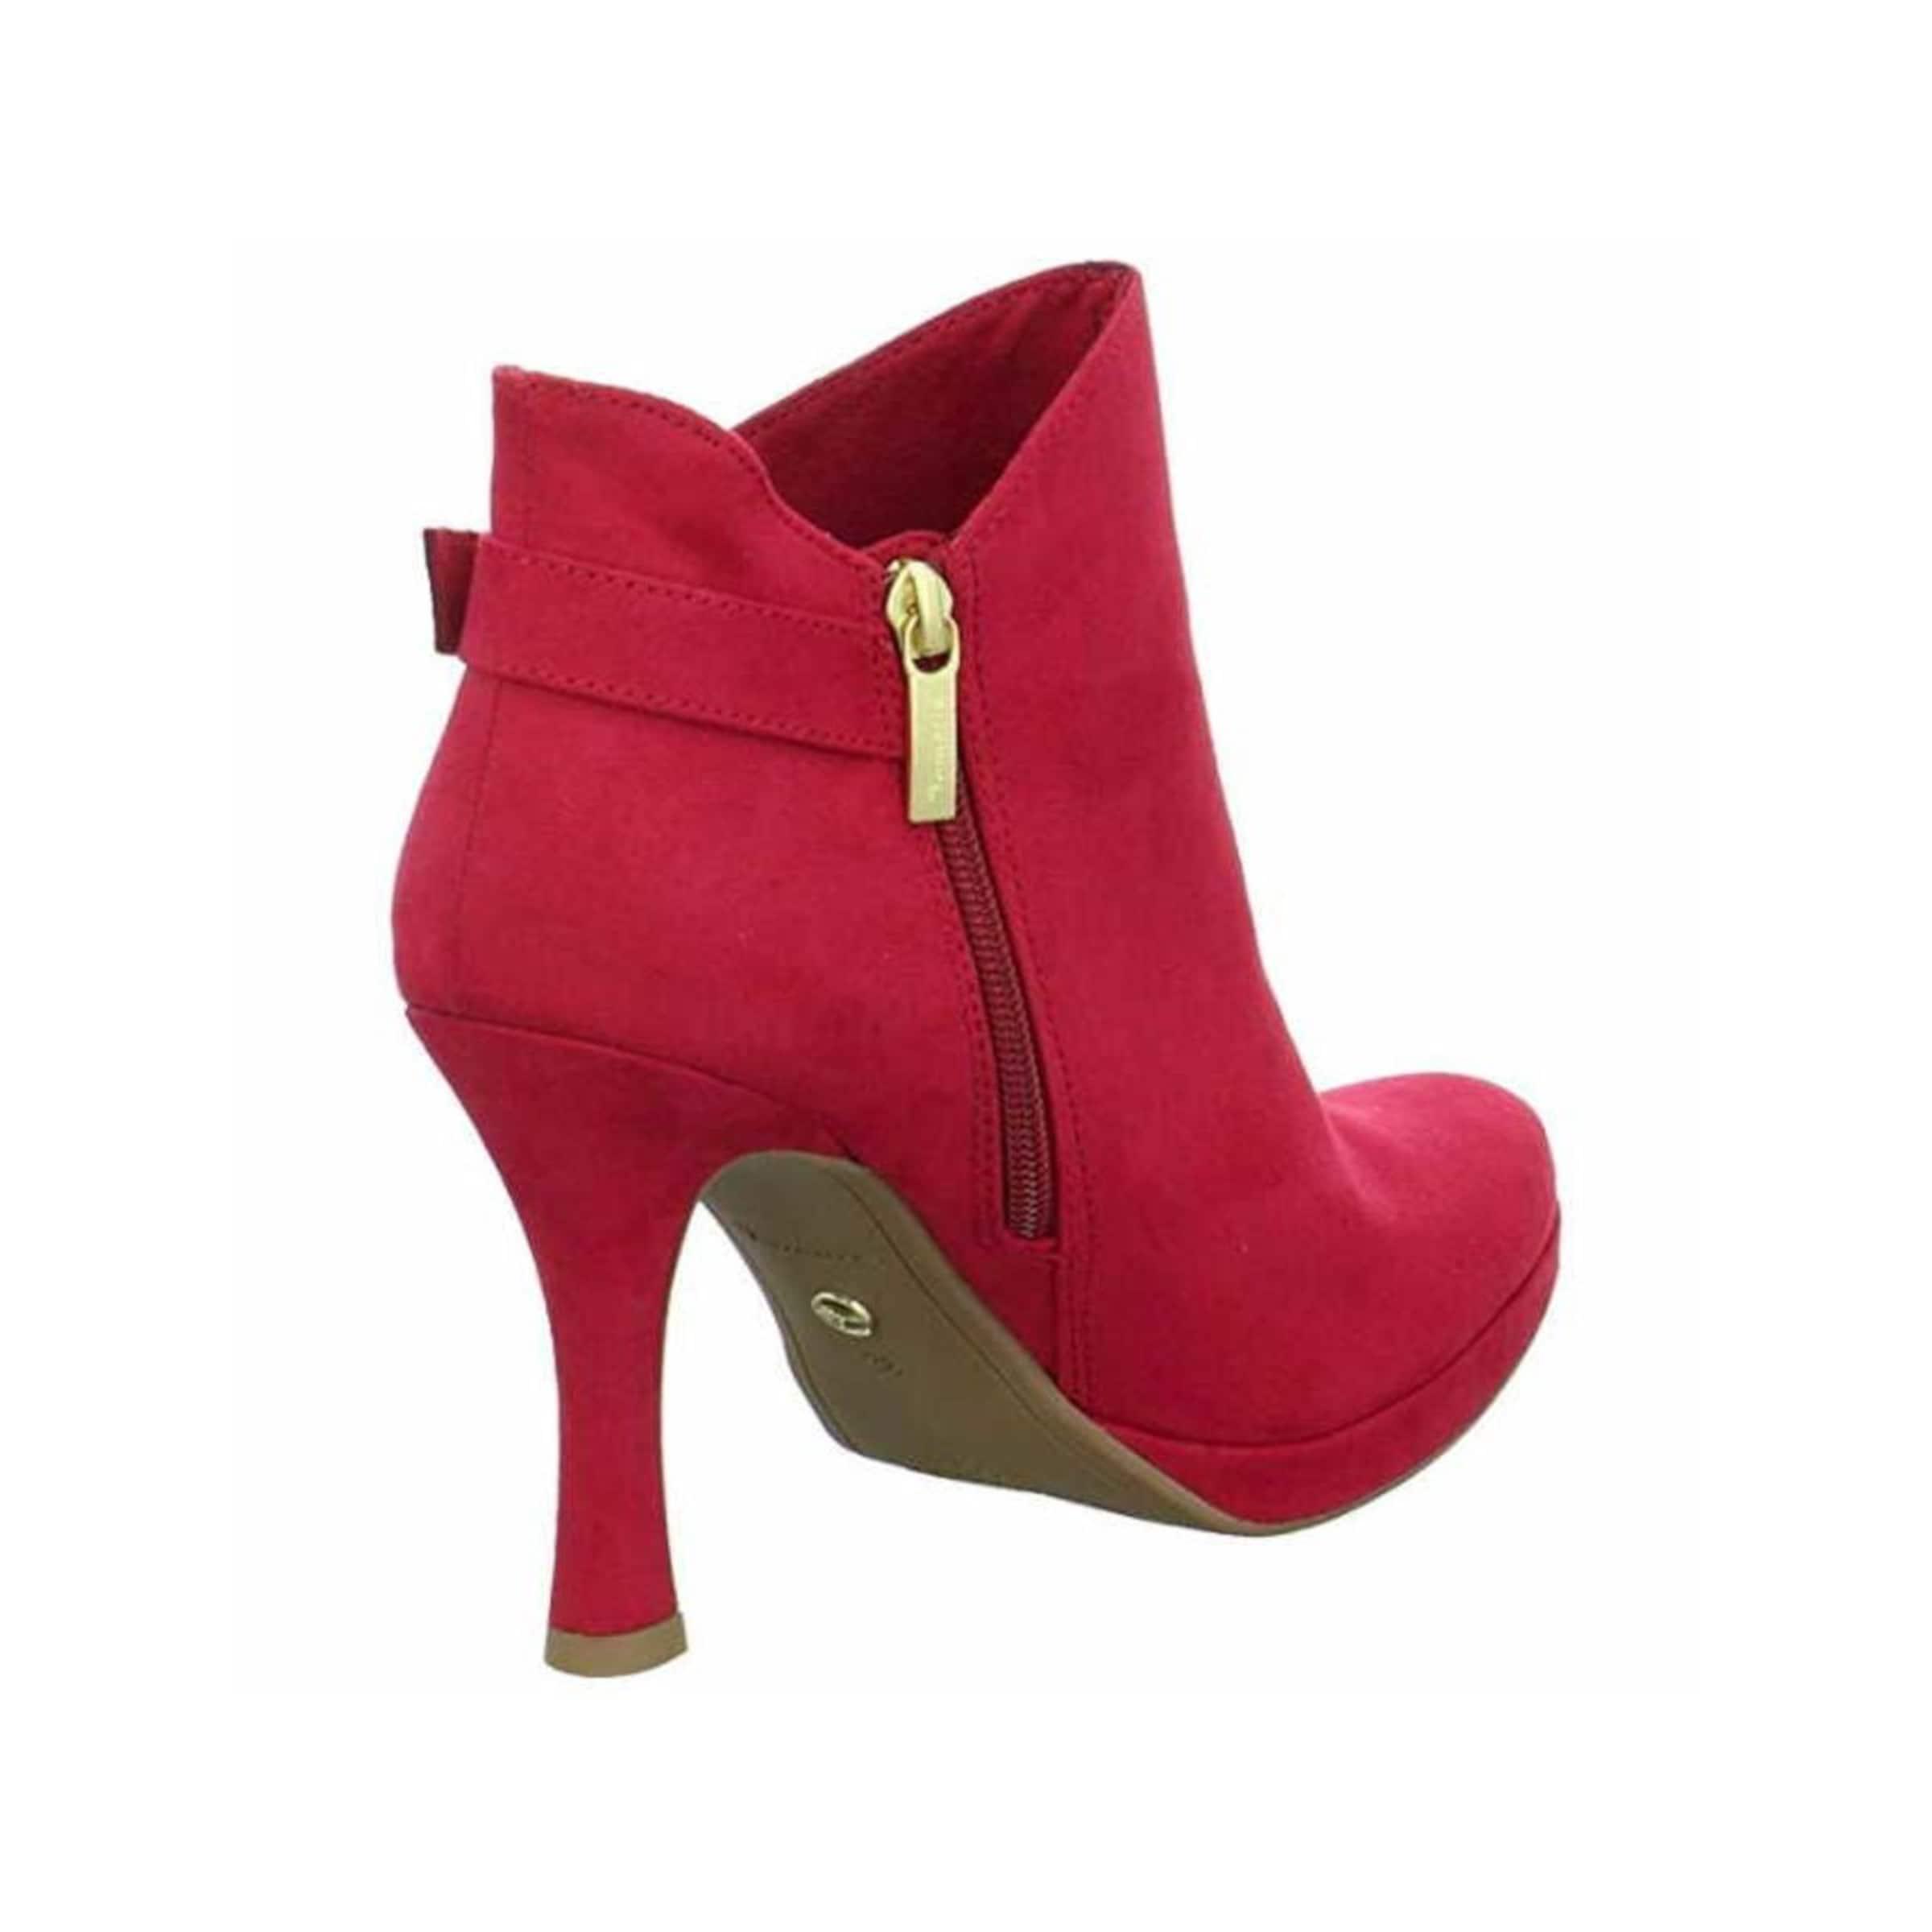 Tamaris Tamaris Stiefel In In Rot Rot In Stiefel Stiefel Tamaris 2EHID9